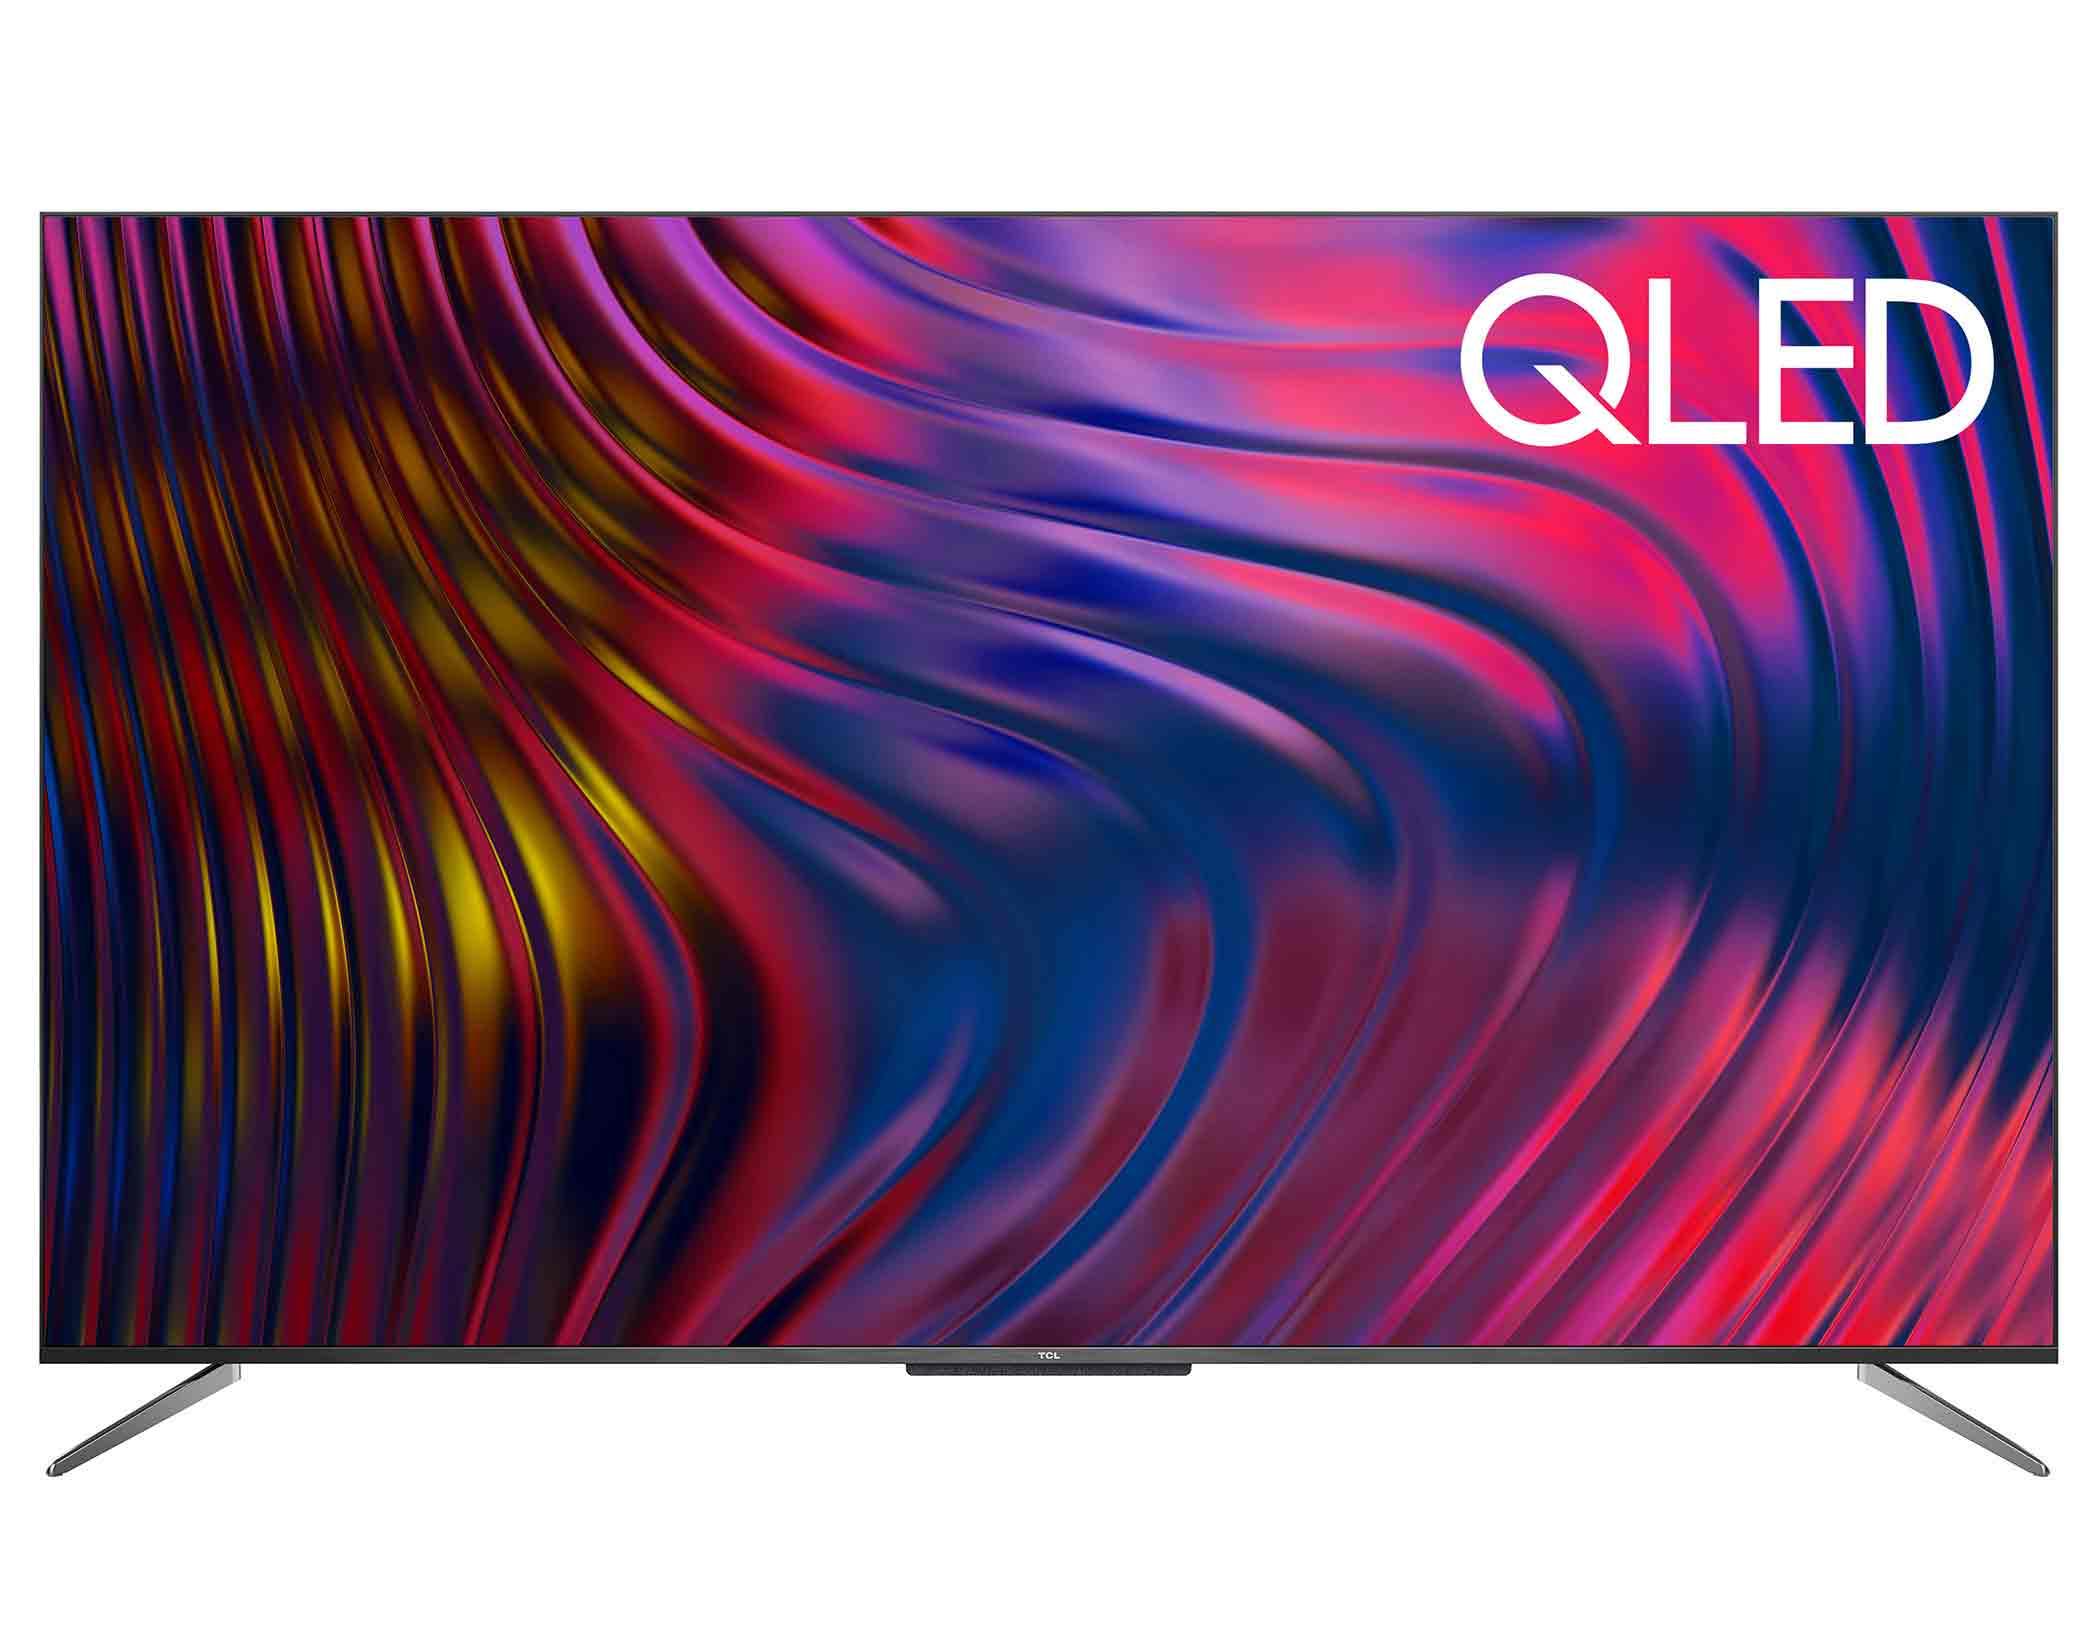 Tcl 55c715 55inch 4k Ultra Hd Smart Led Lcd Tv Bi Rite